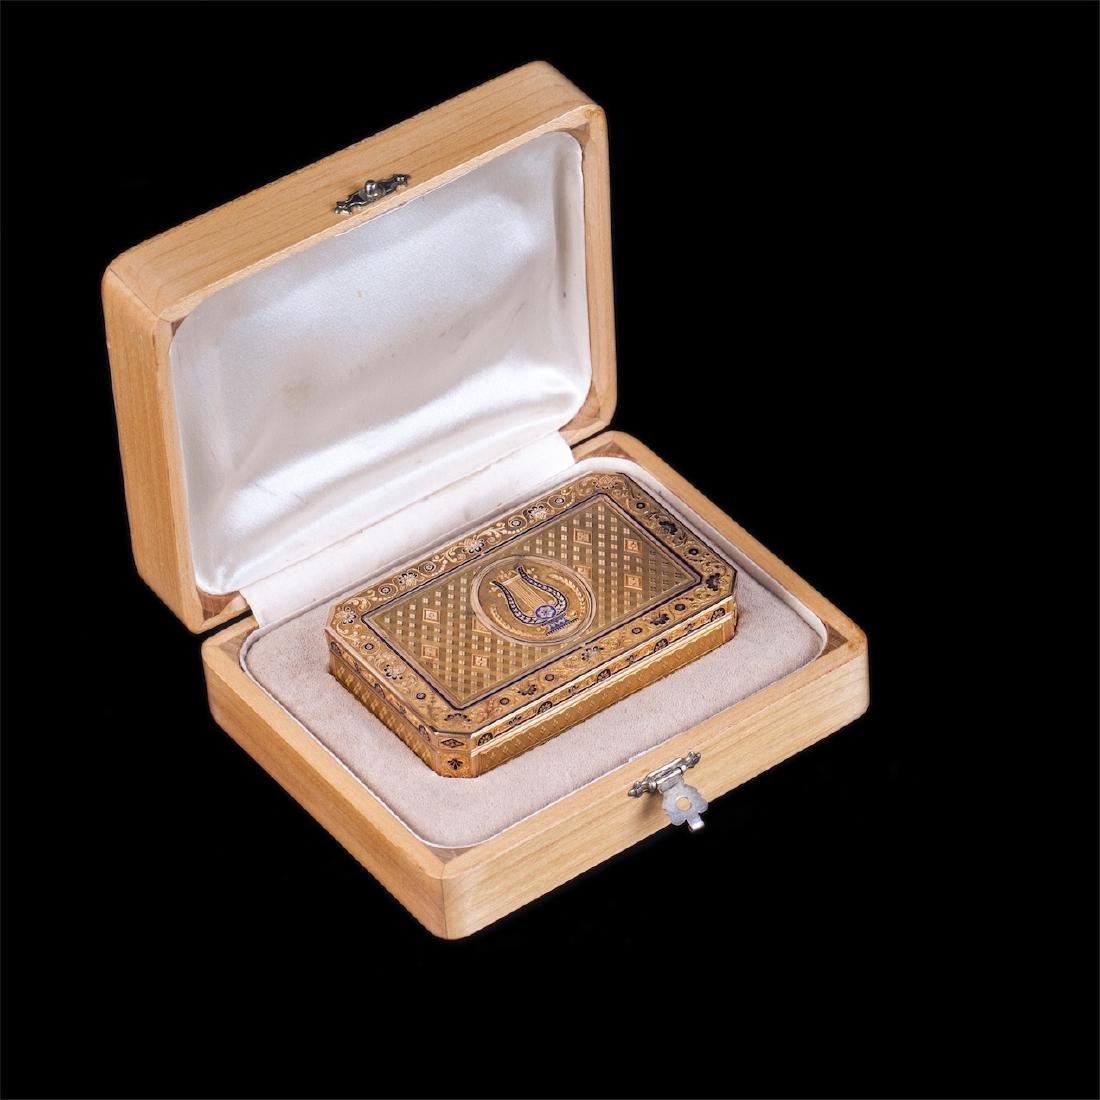 18th century Swiss gold snuff box with harp